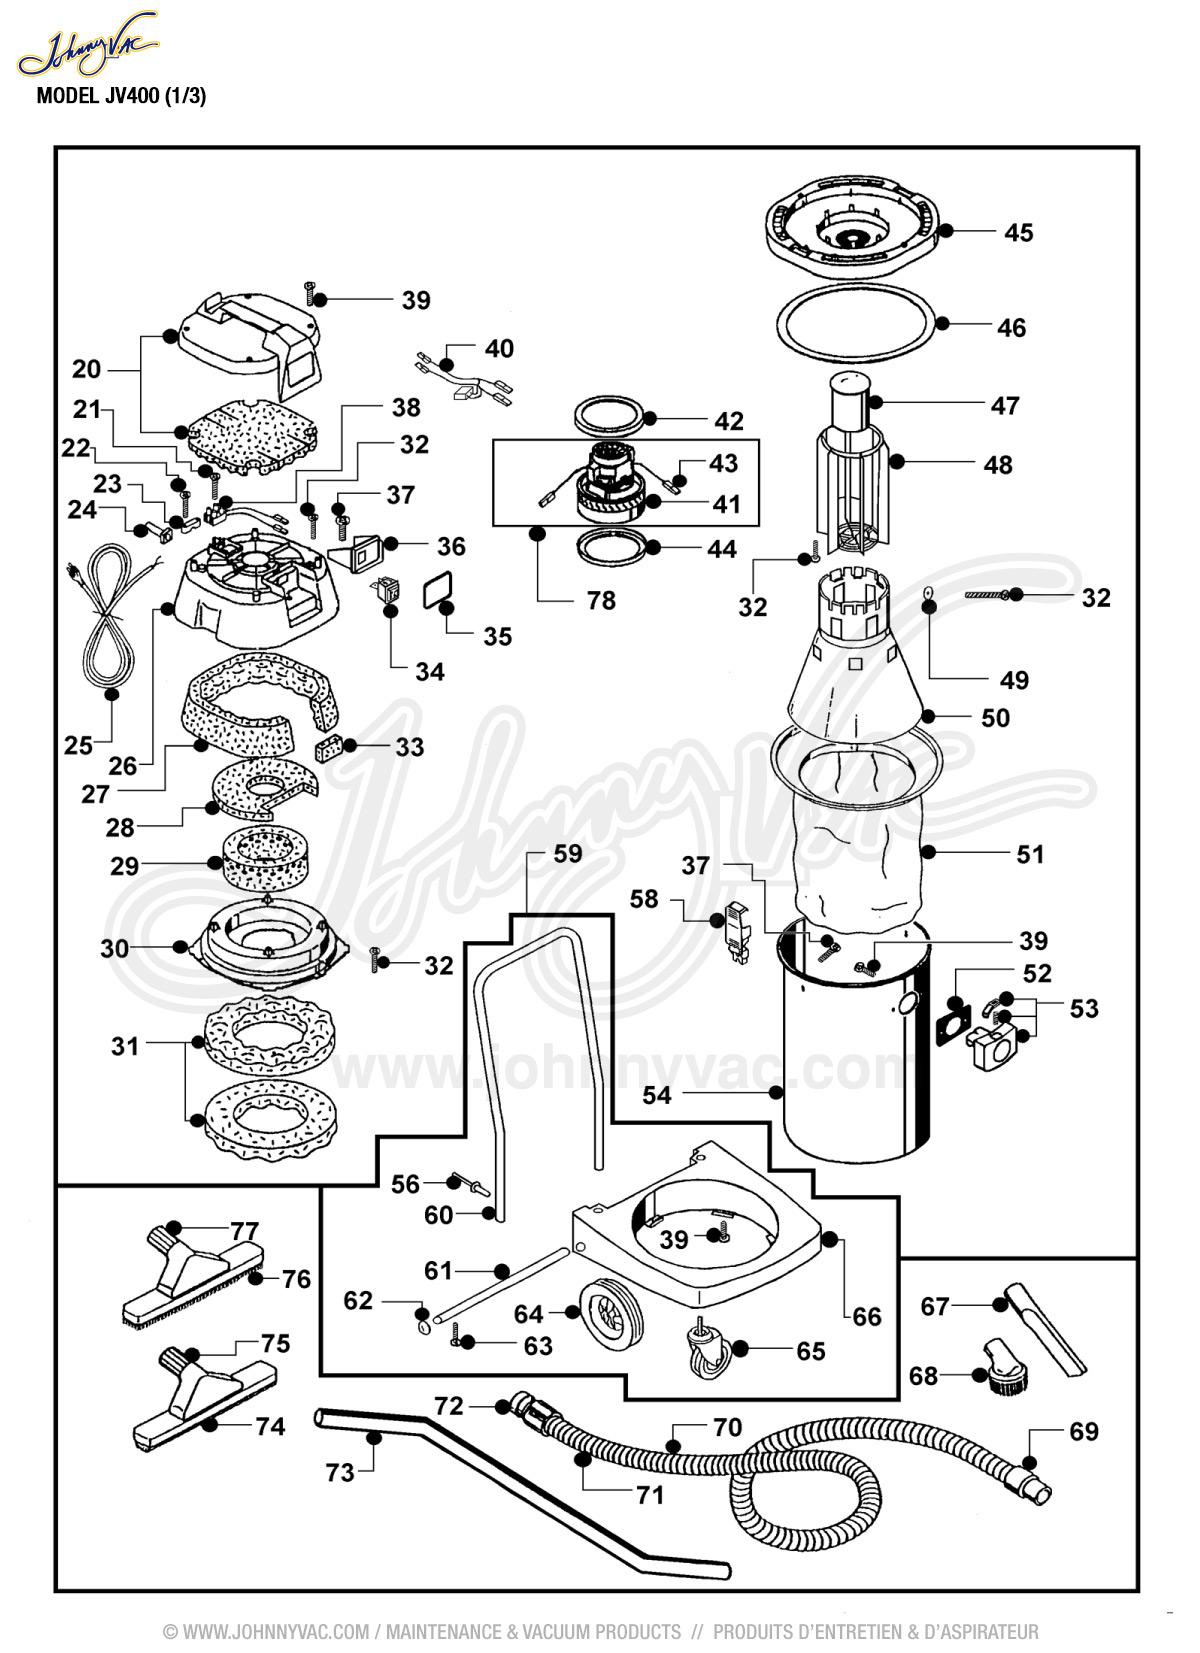 Craftsman 2.5 gallon wet dry vac manual